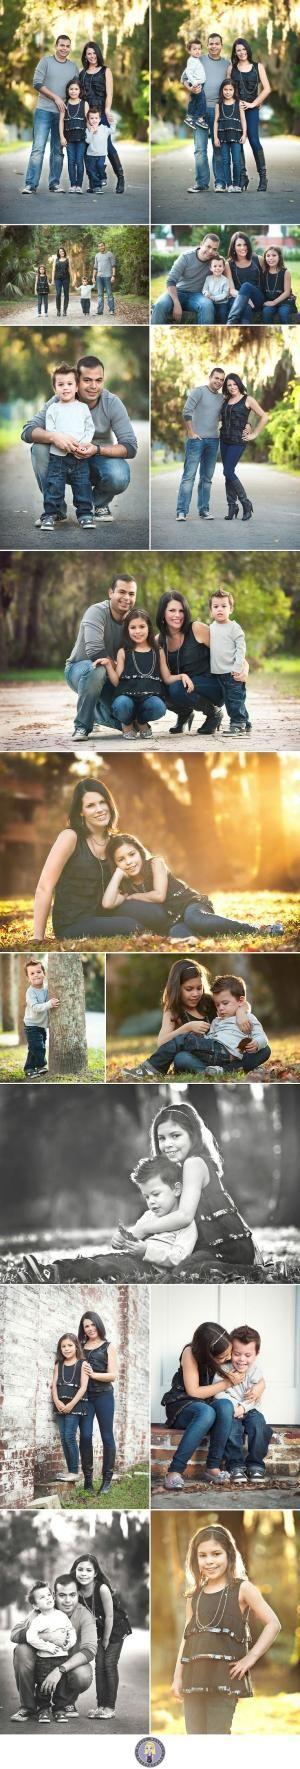 family poses by lgib0429 Mehr